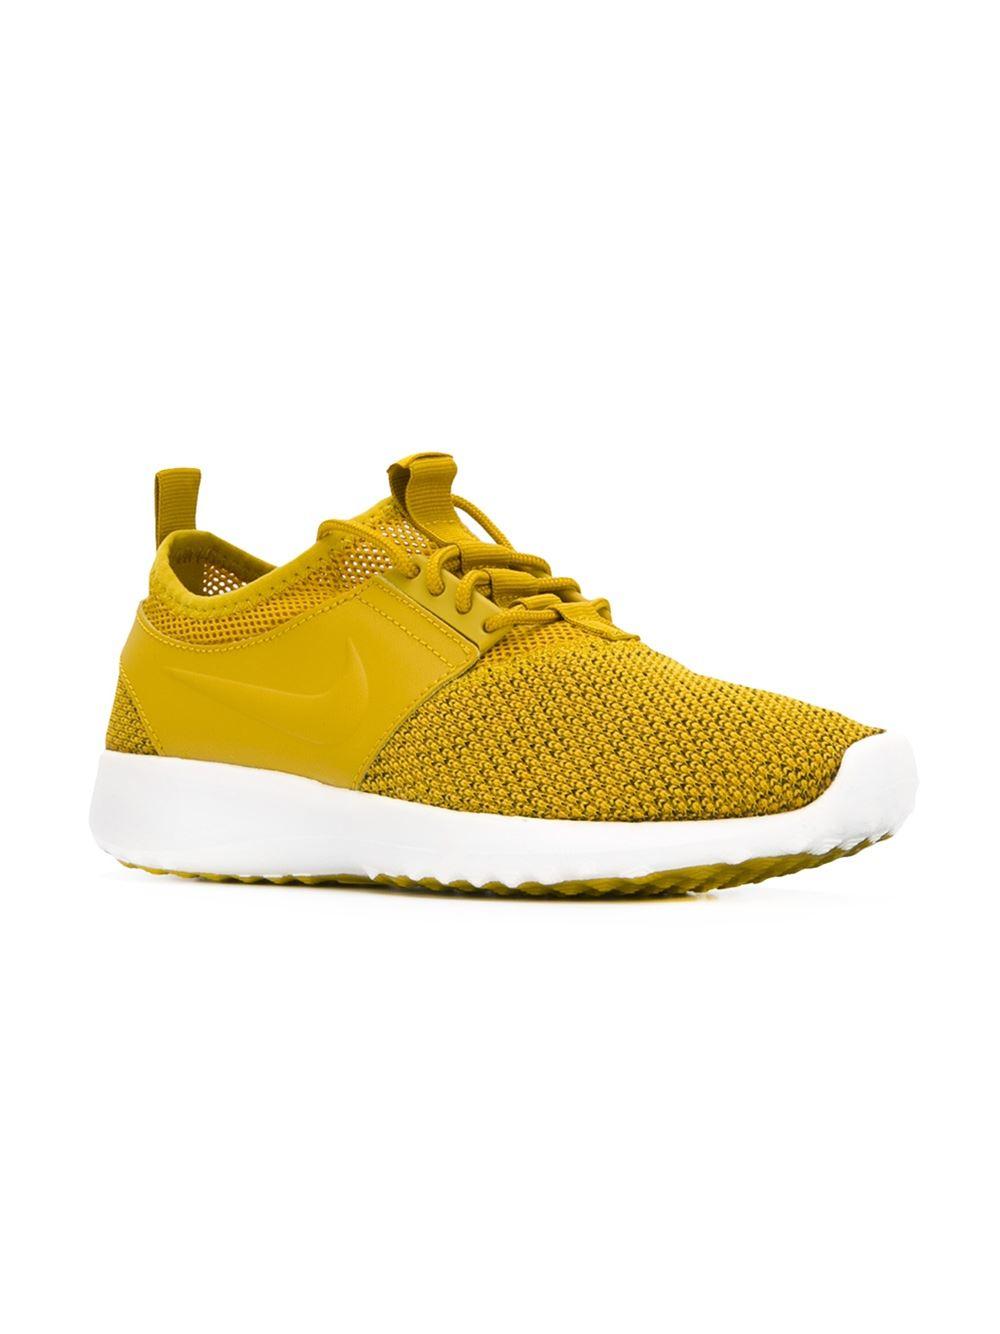 nike juvenate txt sneakers in yellow lyst